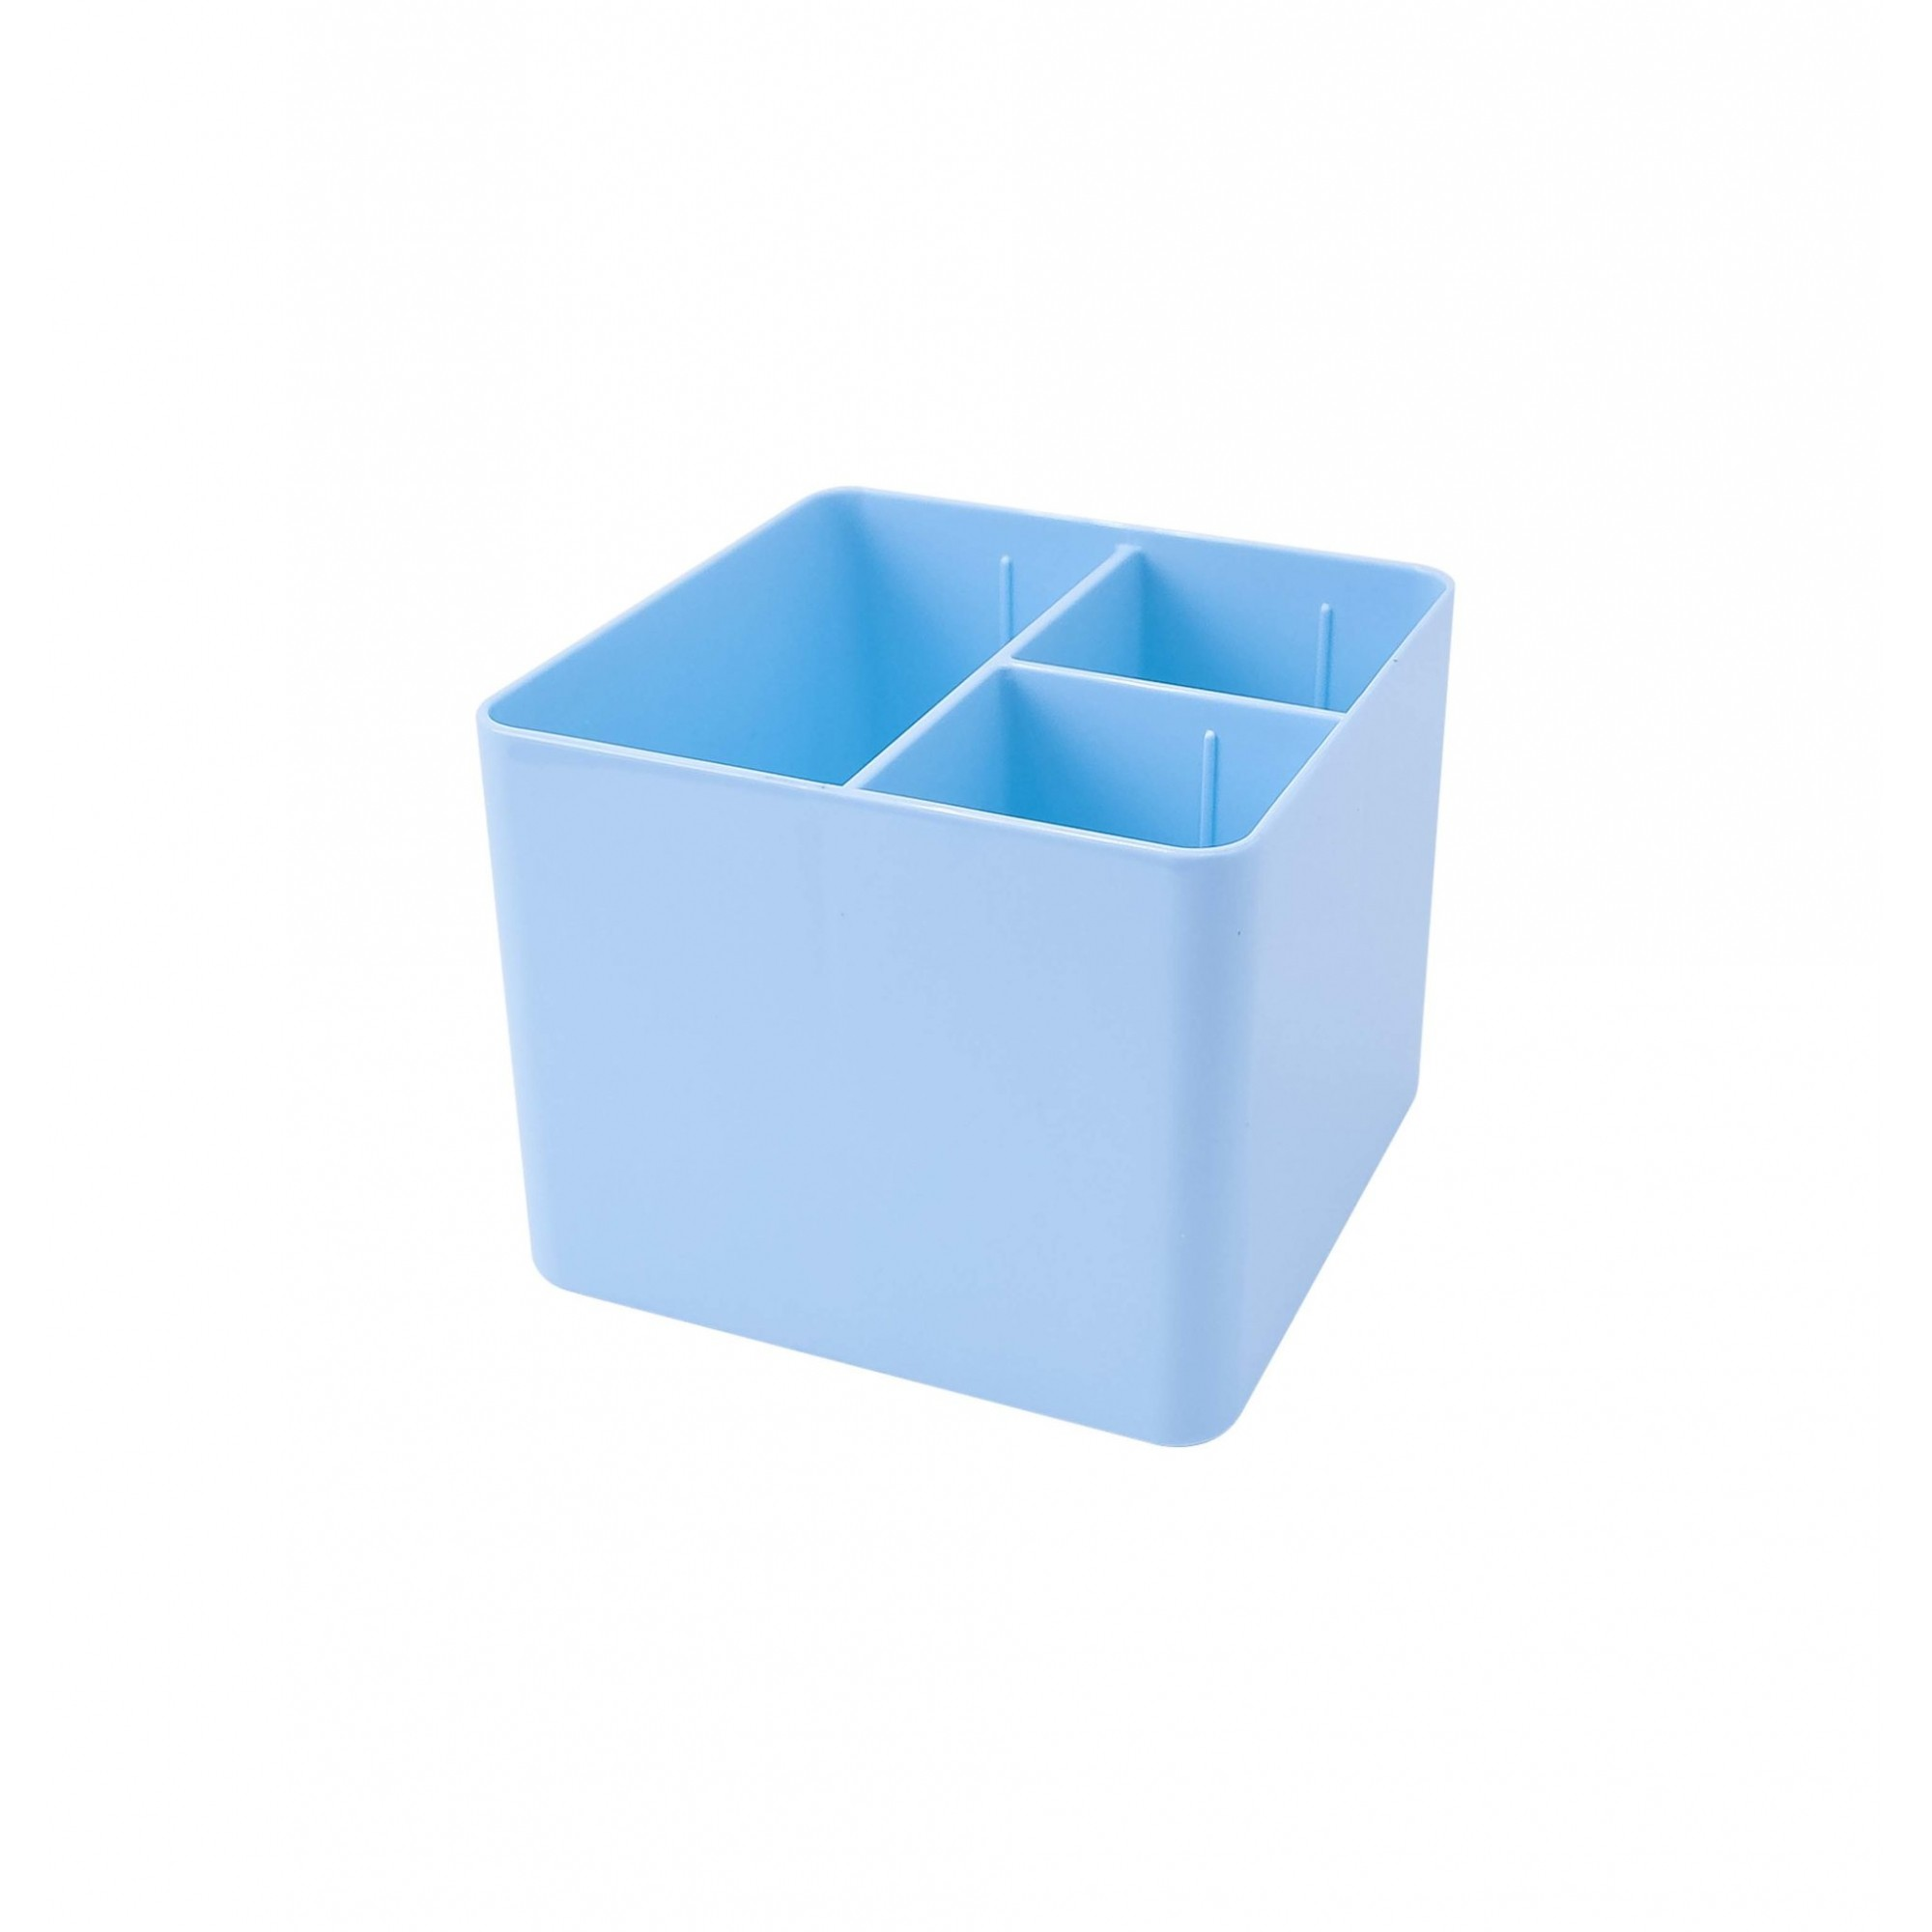 Porta Objetos 3 Divisorias Dello Azul Pastel 3020.Bp.0006 29651